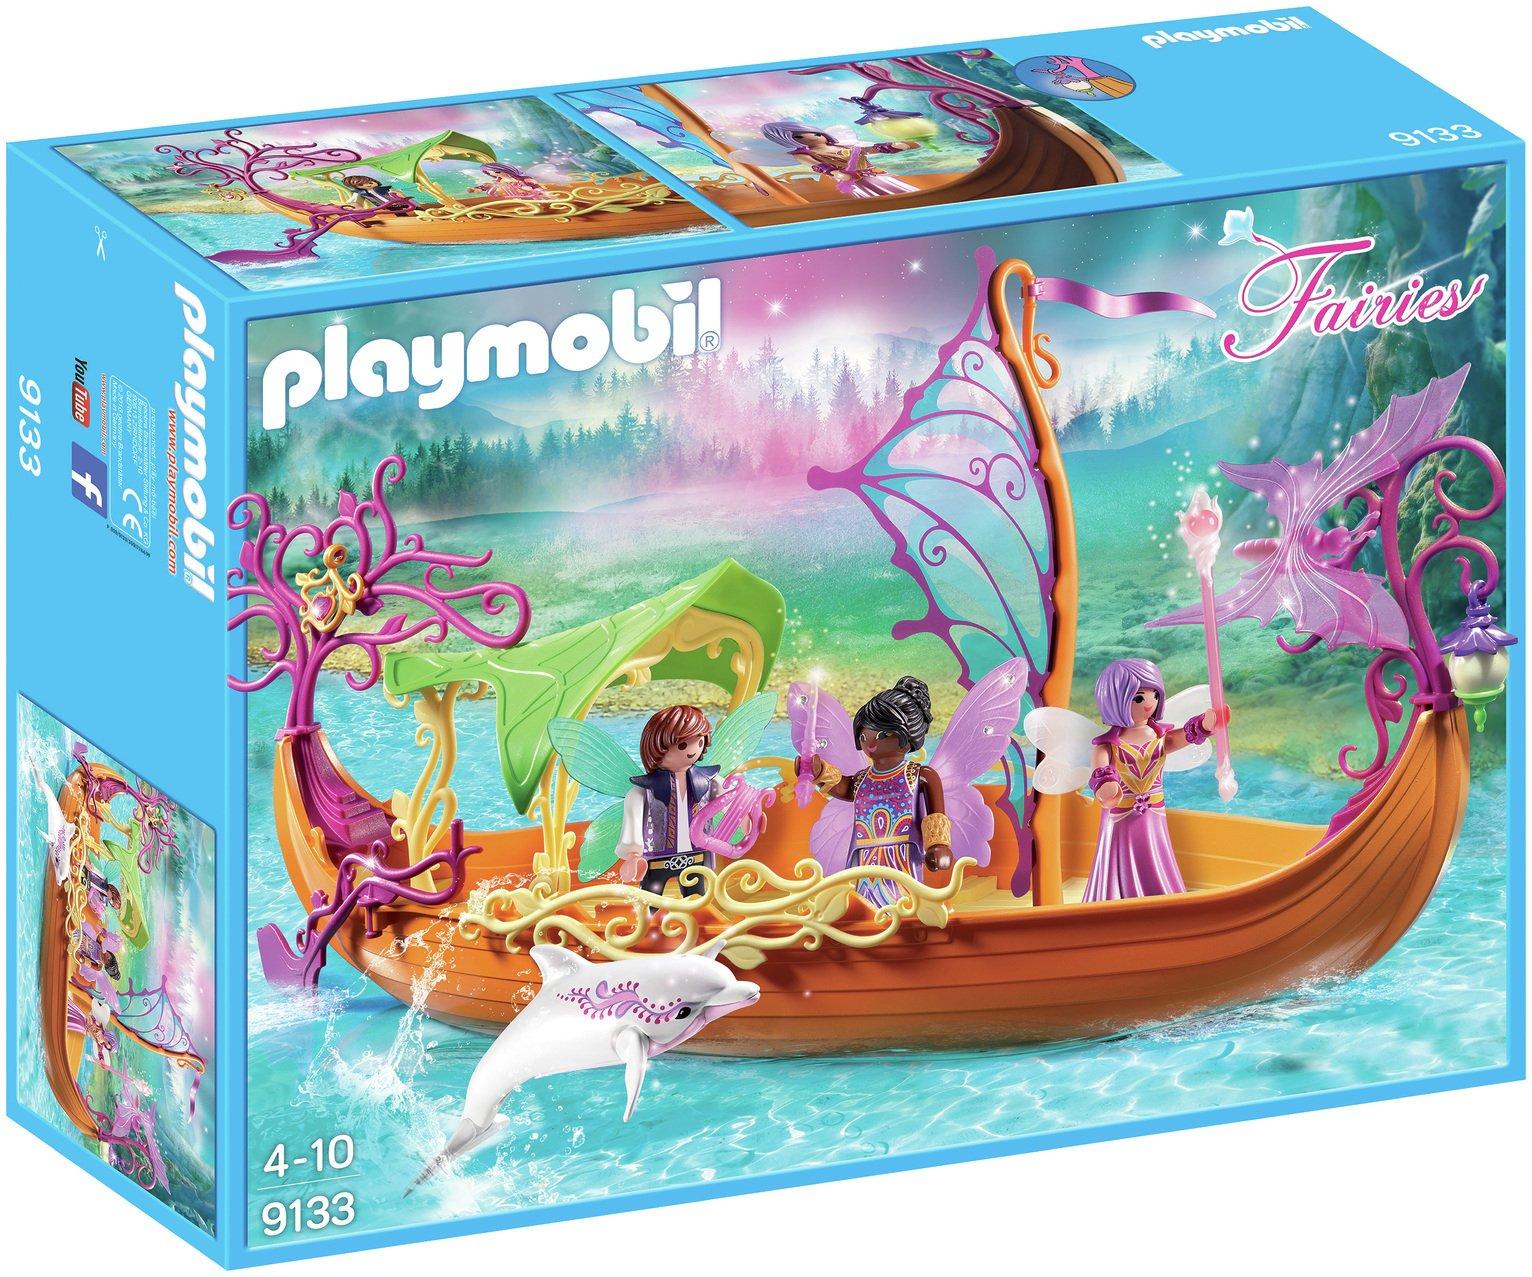 Playmobil 9133 Fairies Enchanted Fairy Ship